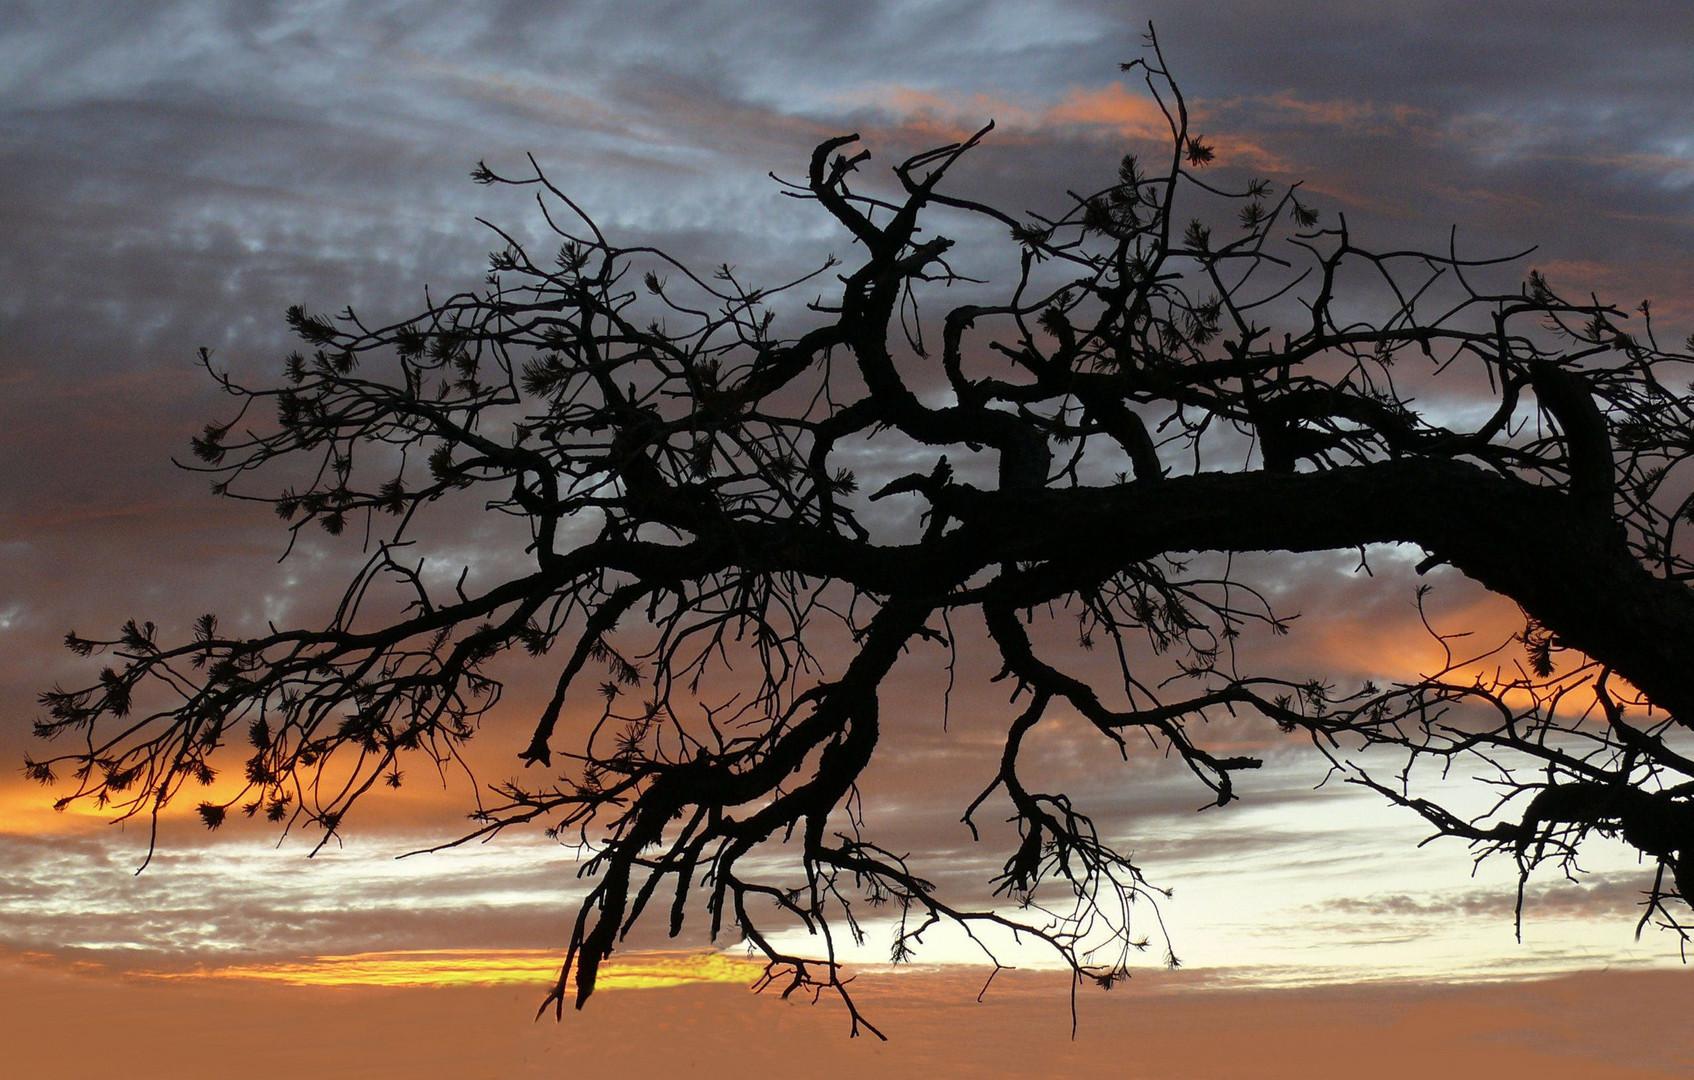 USA 2011 - Sonnenuntergang im Herbst